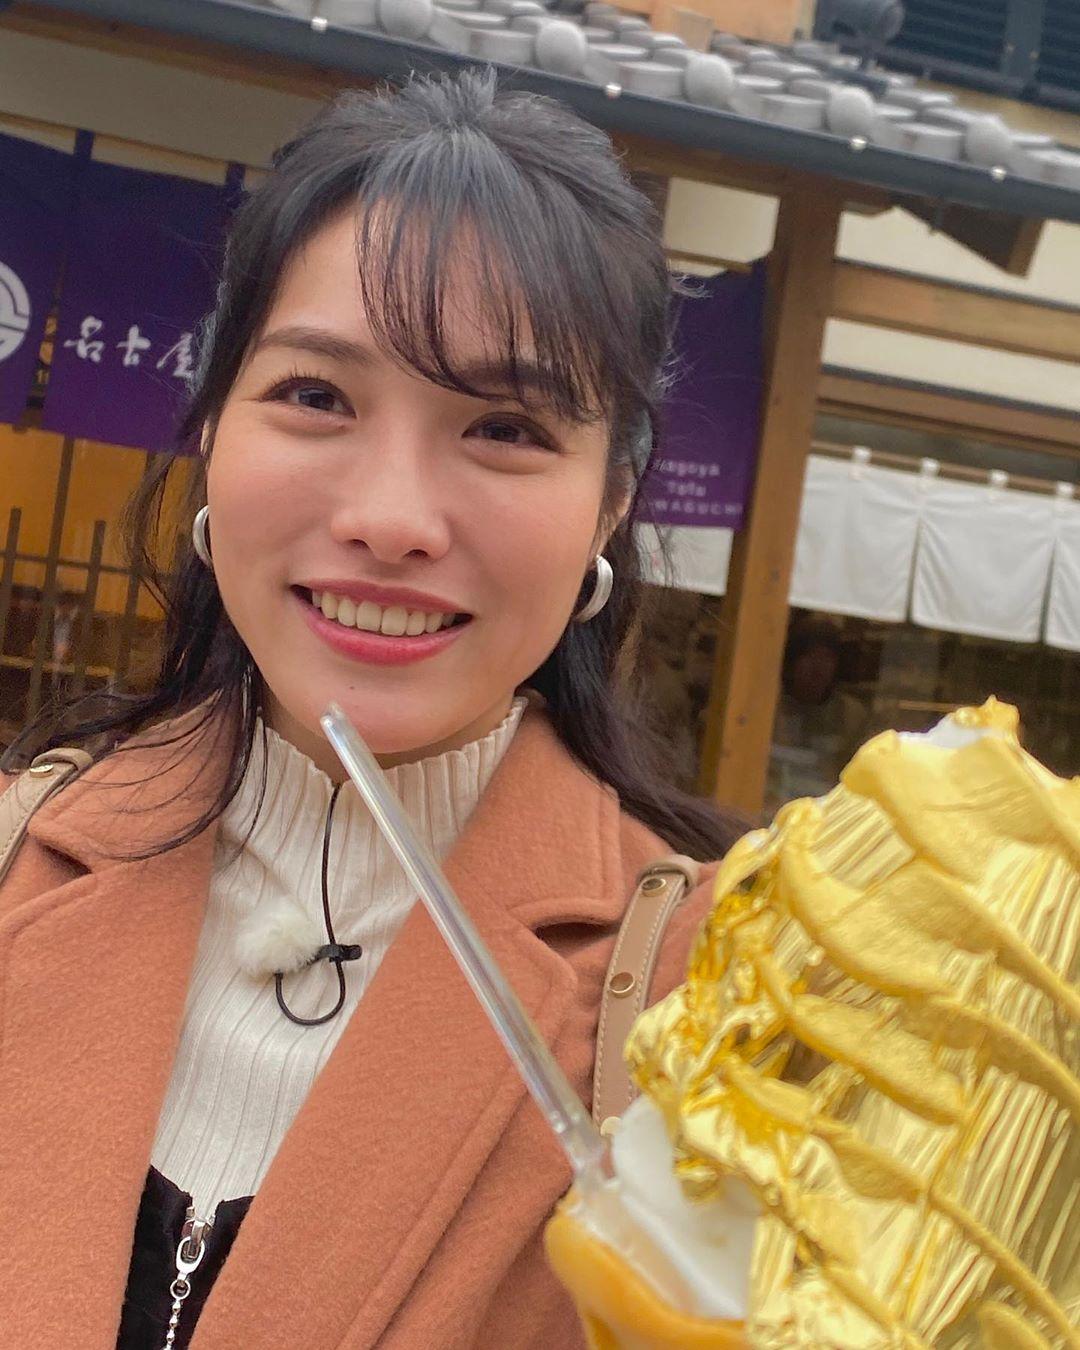 konno_anna185.jpg